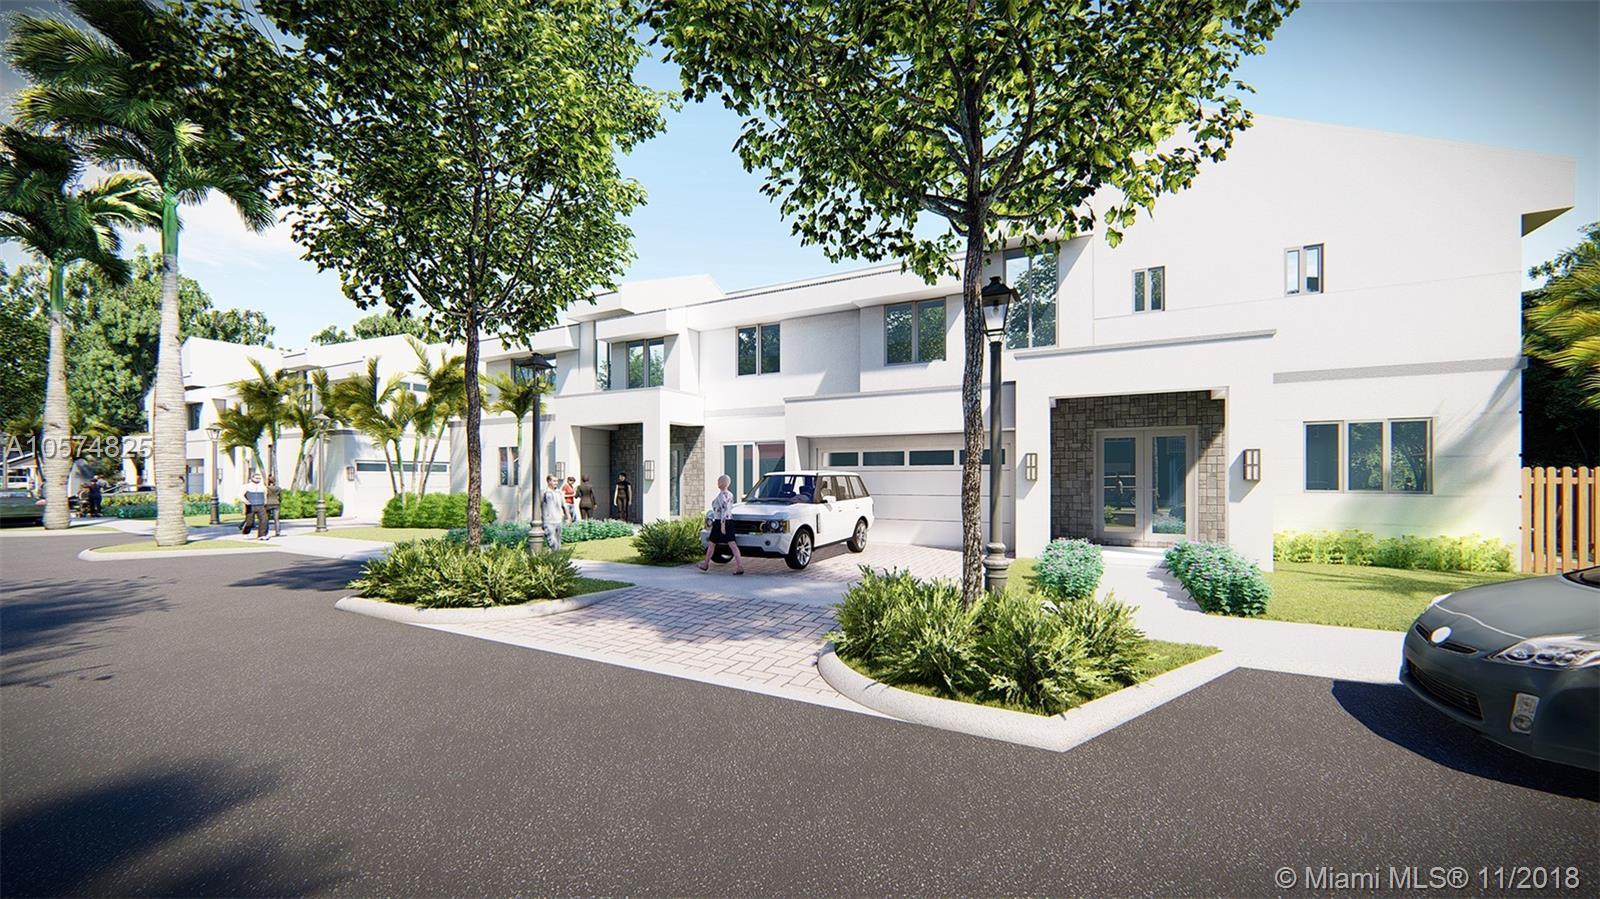 1124 NE 14th Ave #C Property Photo - Fort Lauderdale, FL real estate listing